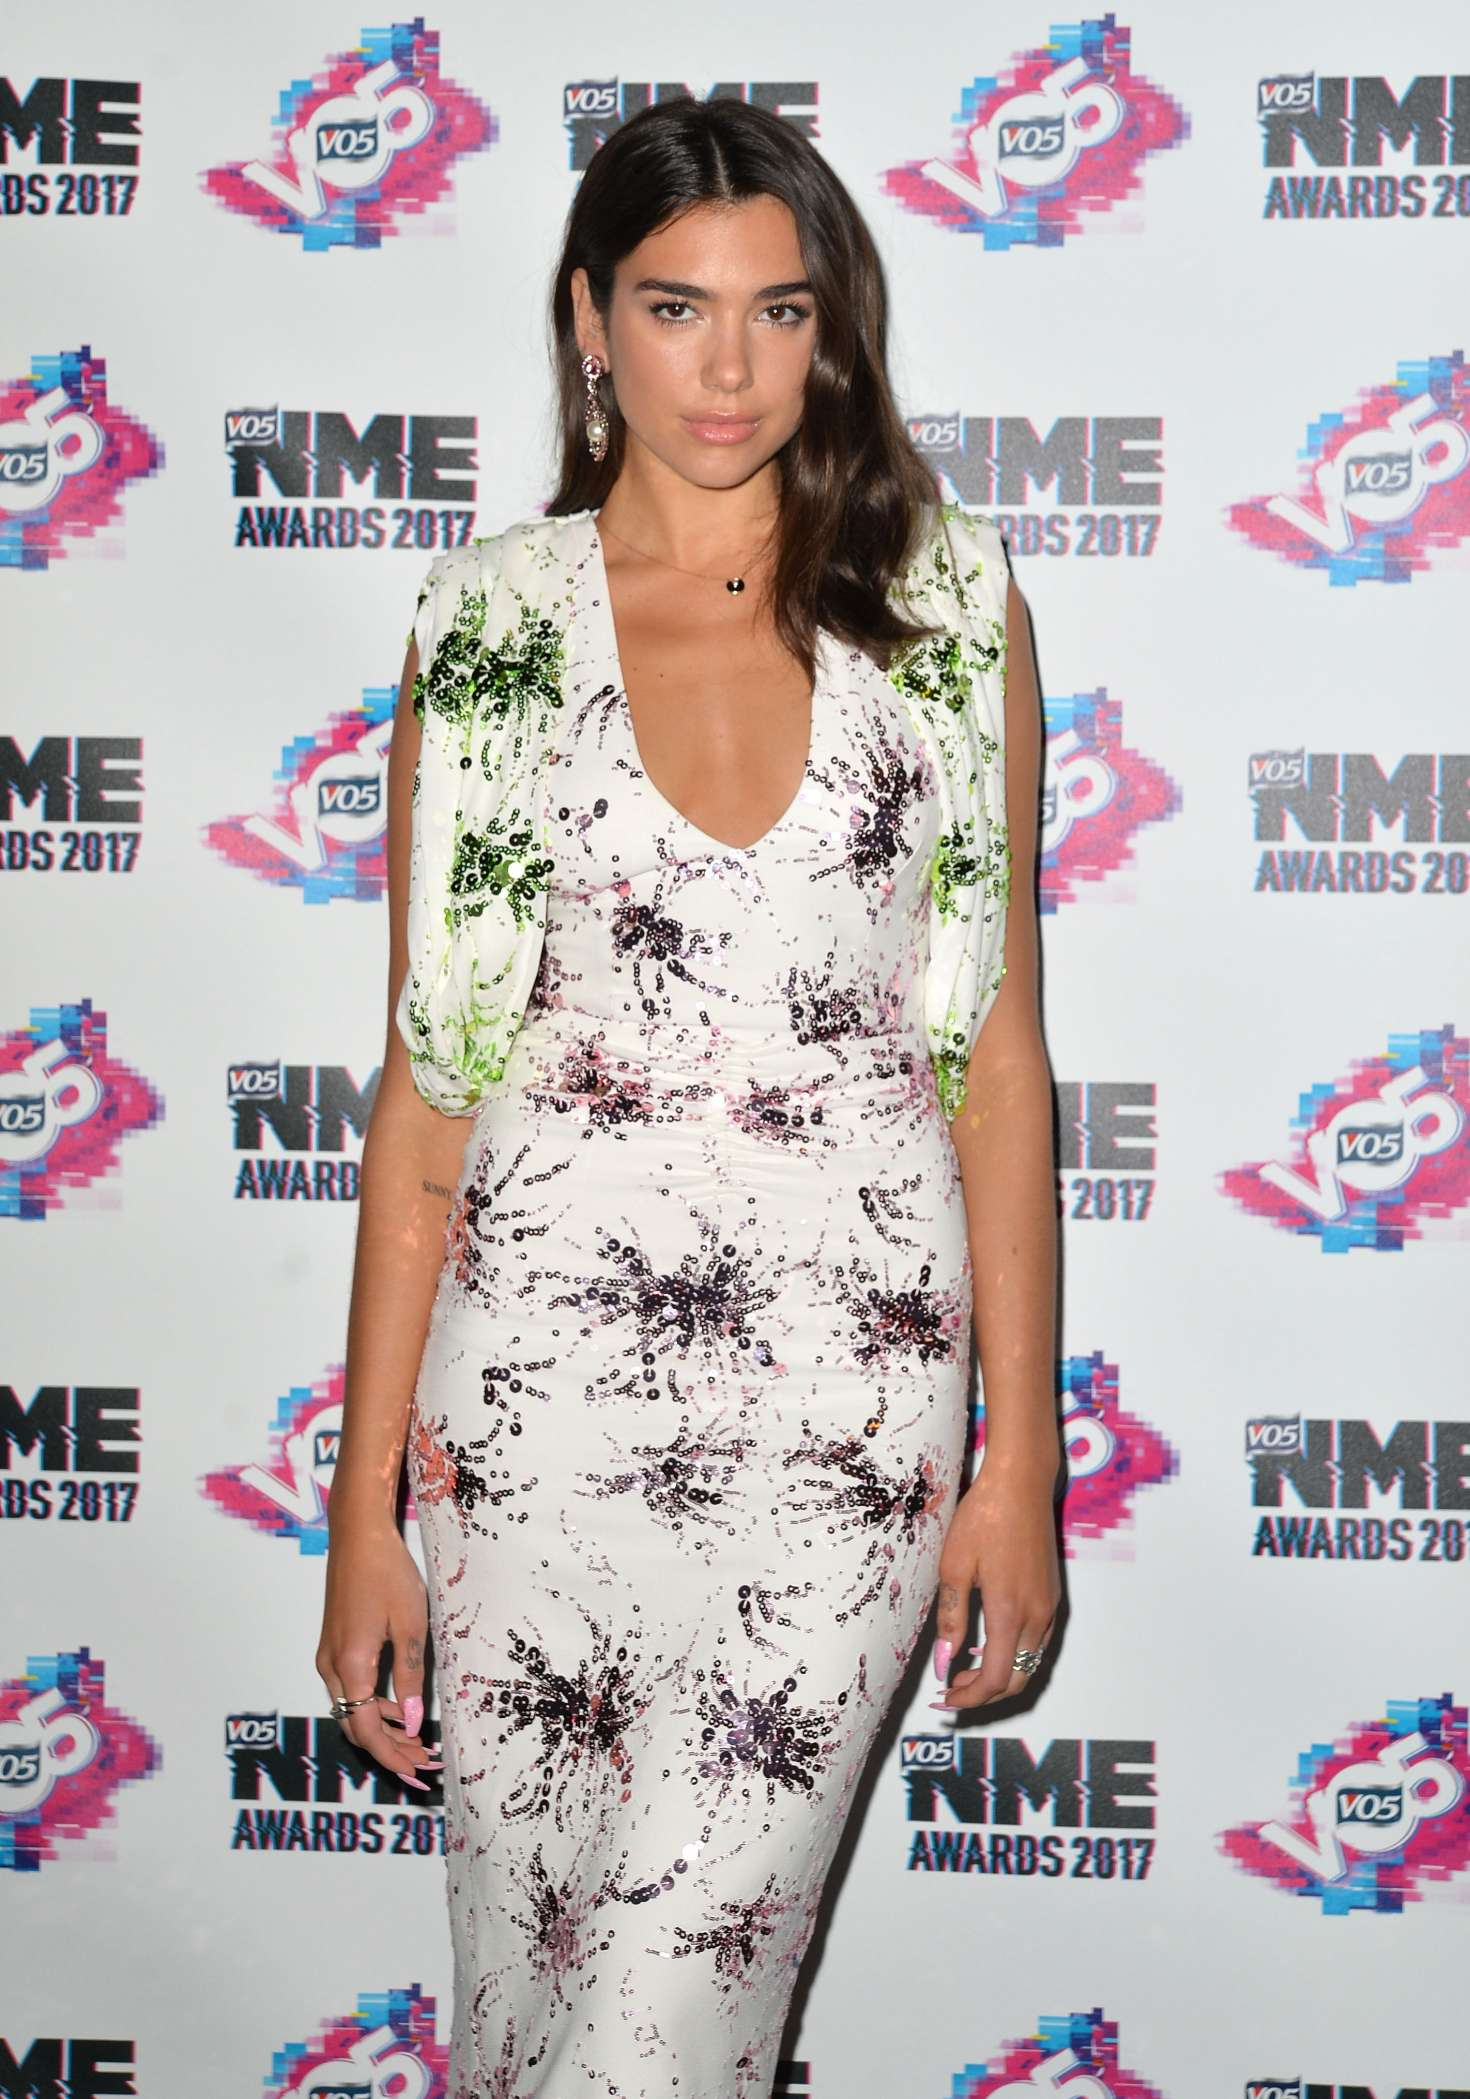 Dua Lipa - 2017 NME Awards in London